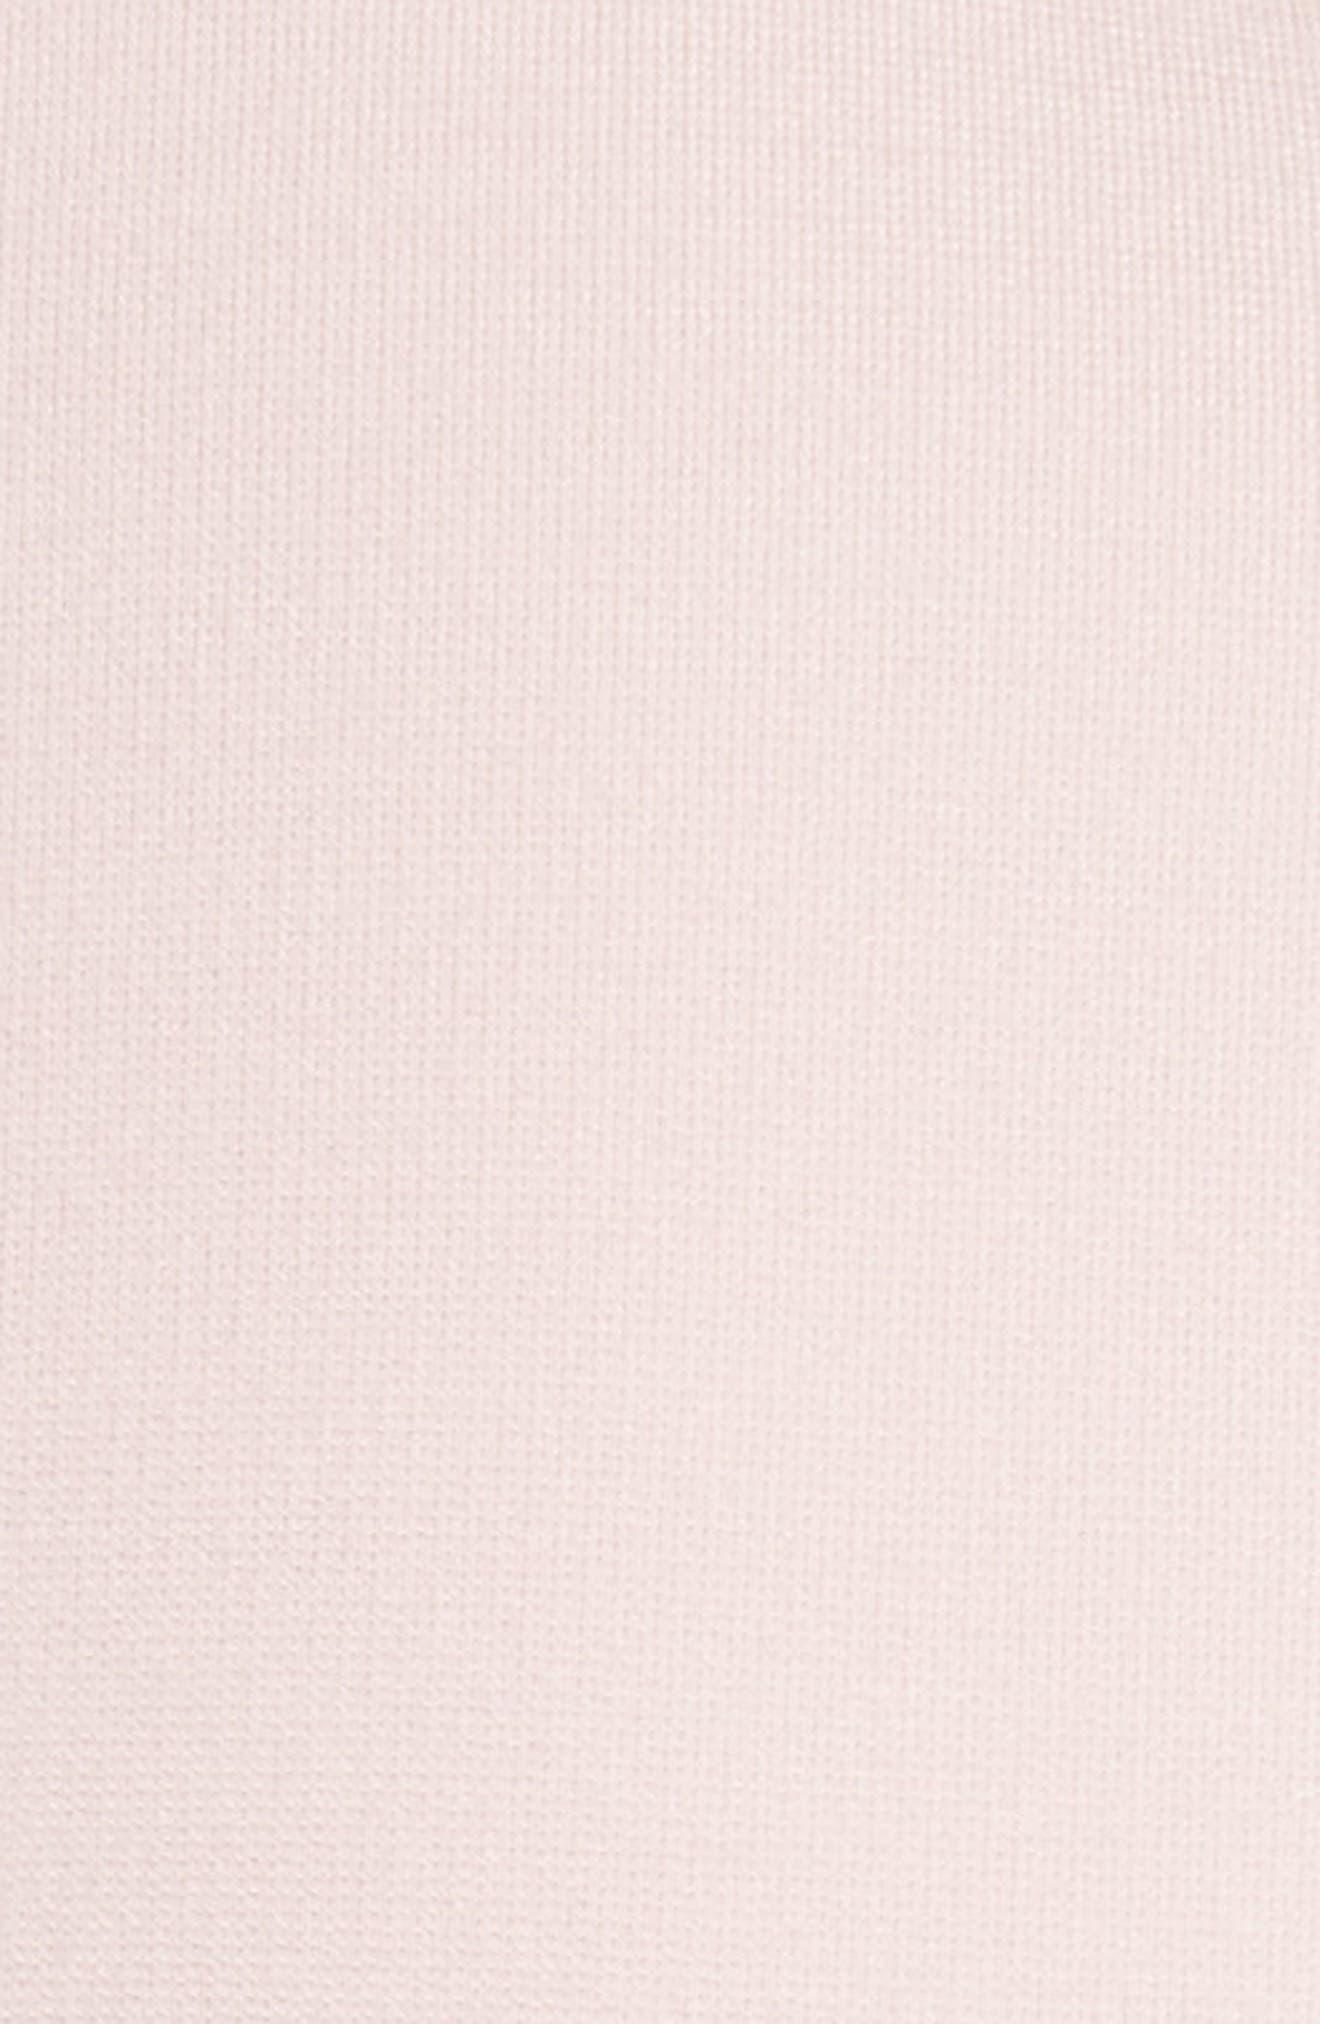 Eloquent Jacquard Skater Dress,                             Alternate thumbnail 5, color,                             680